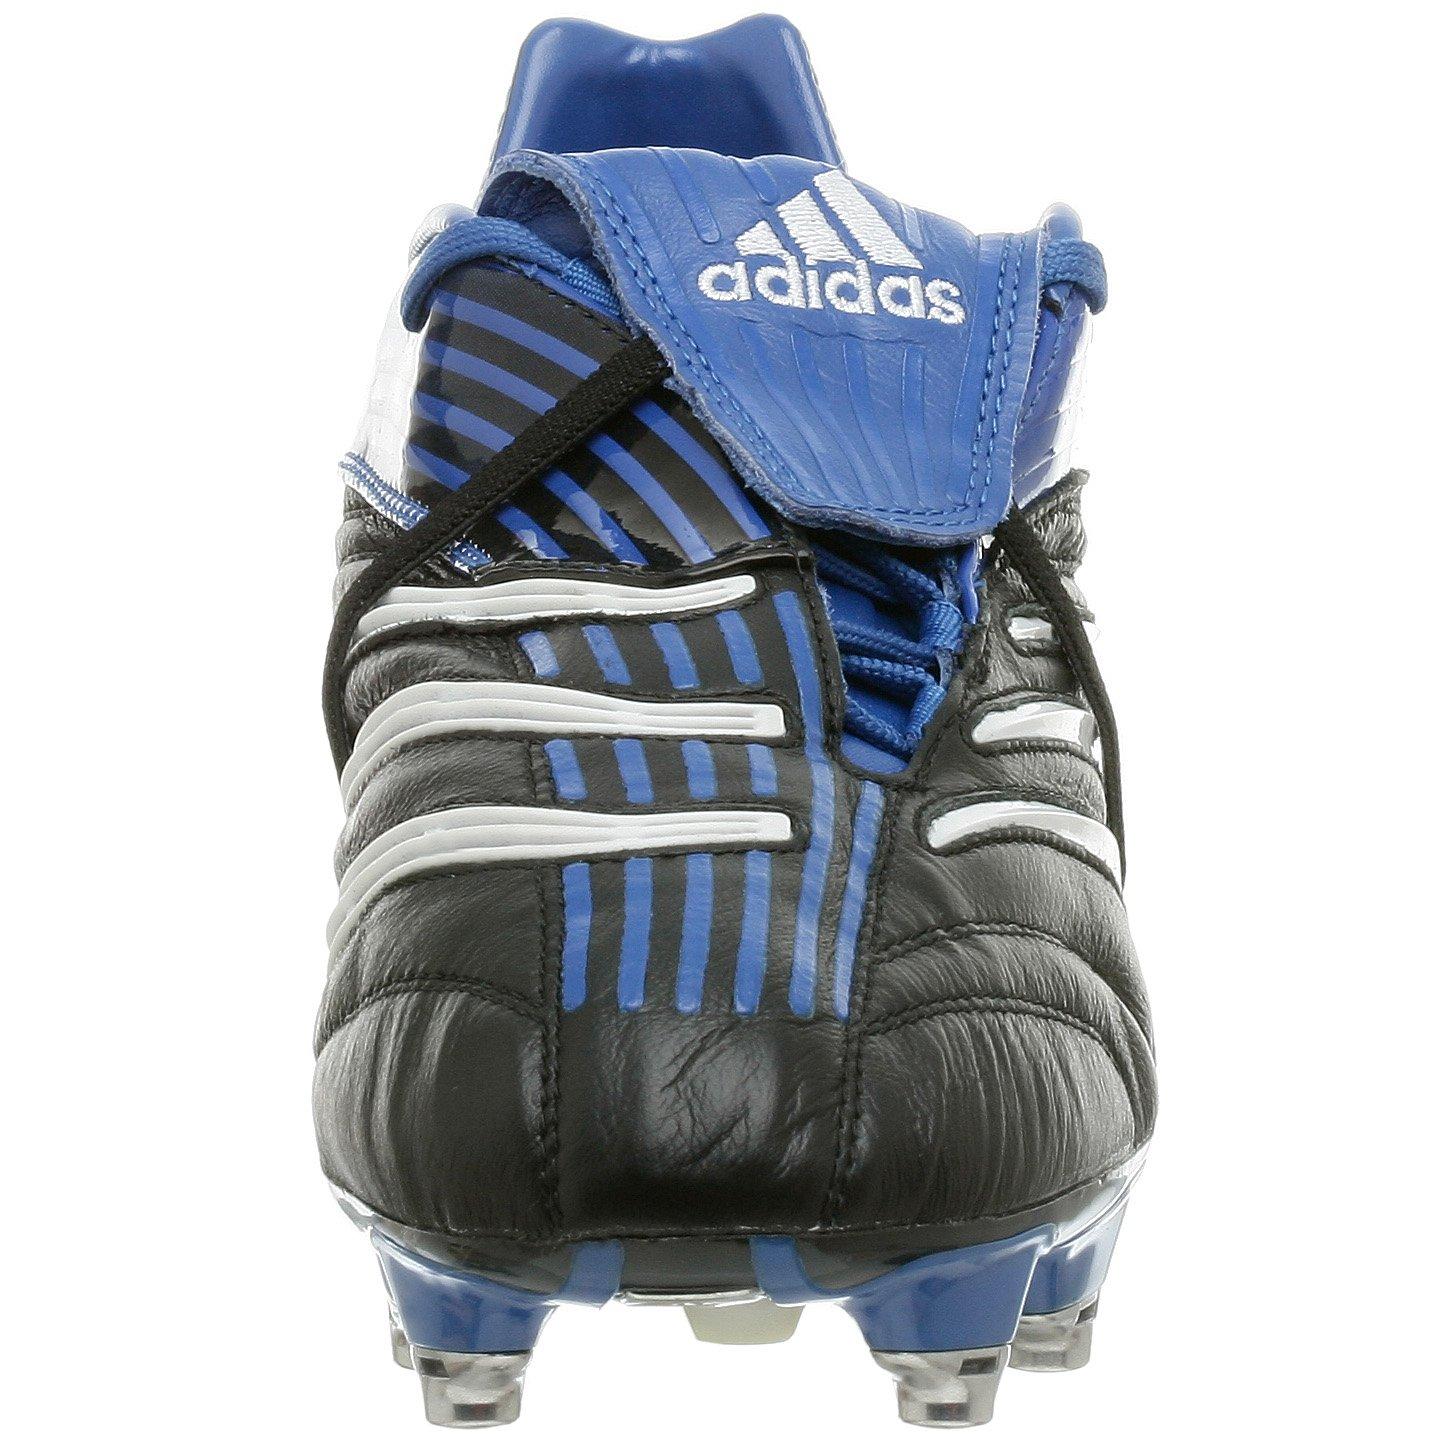 4edfdec702ac ... discount code for adidas mens predator absolute xtrx sg rugby shoe black  rnwht mstrblu 13 m